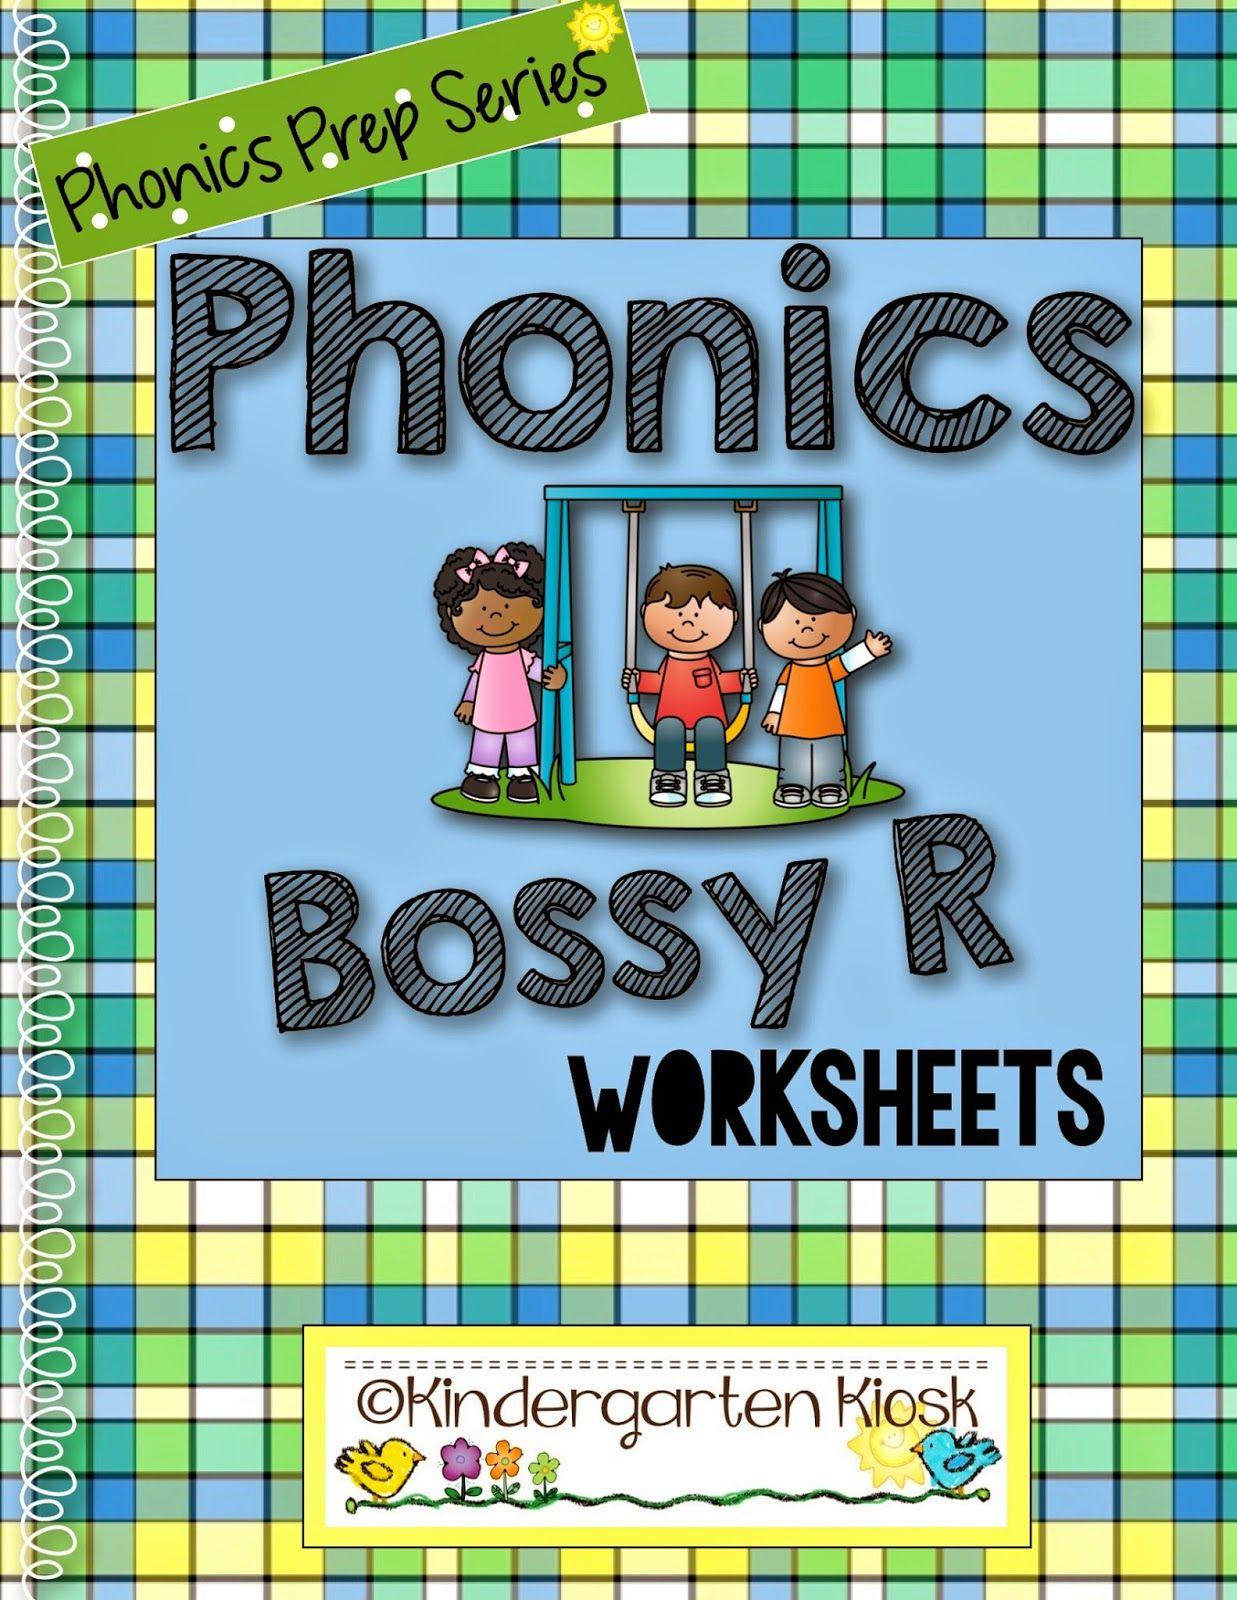 Phonics Prep Bossy R Worksheets